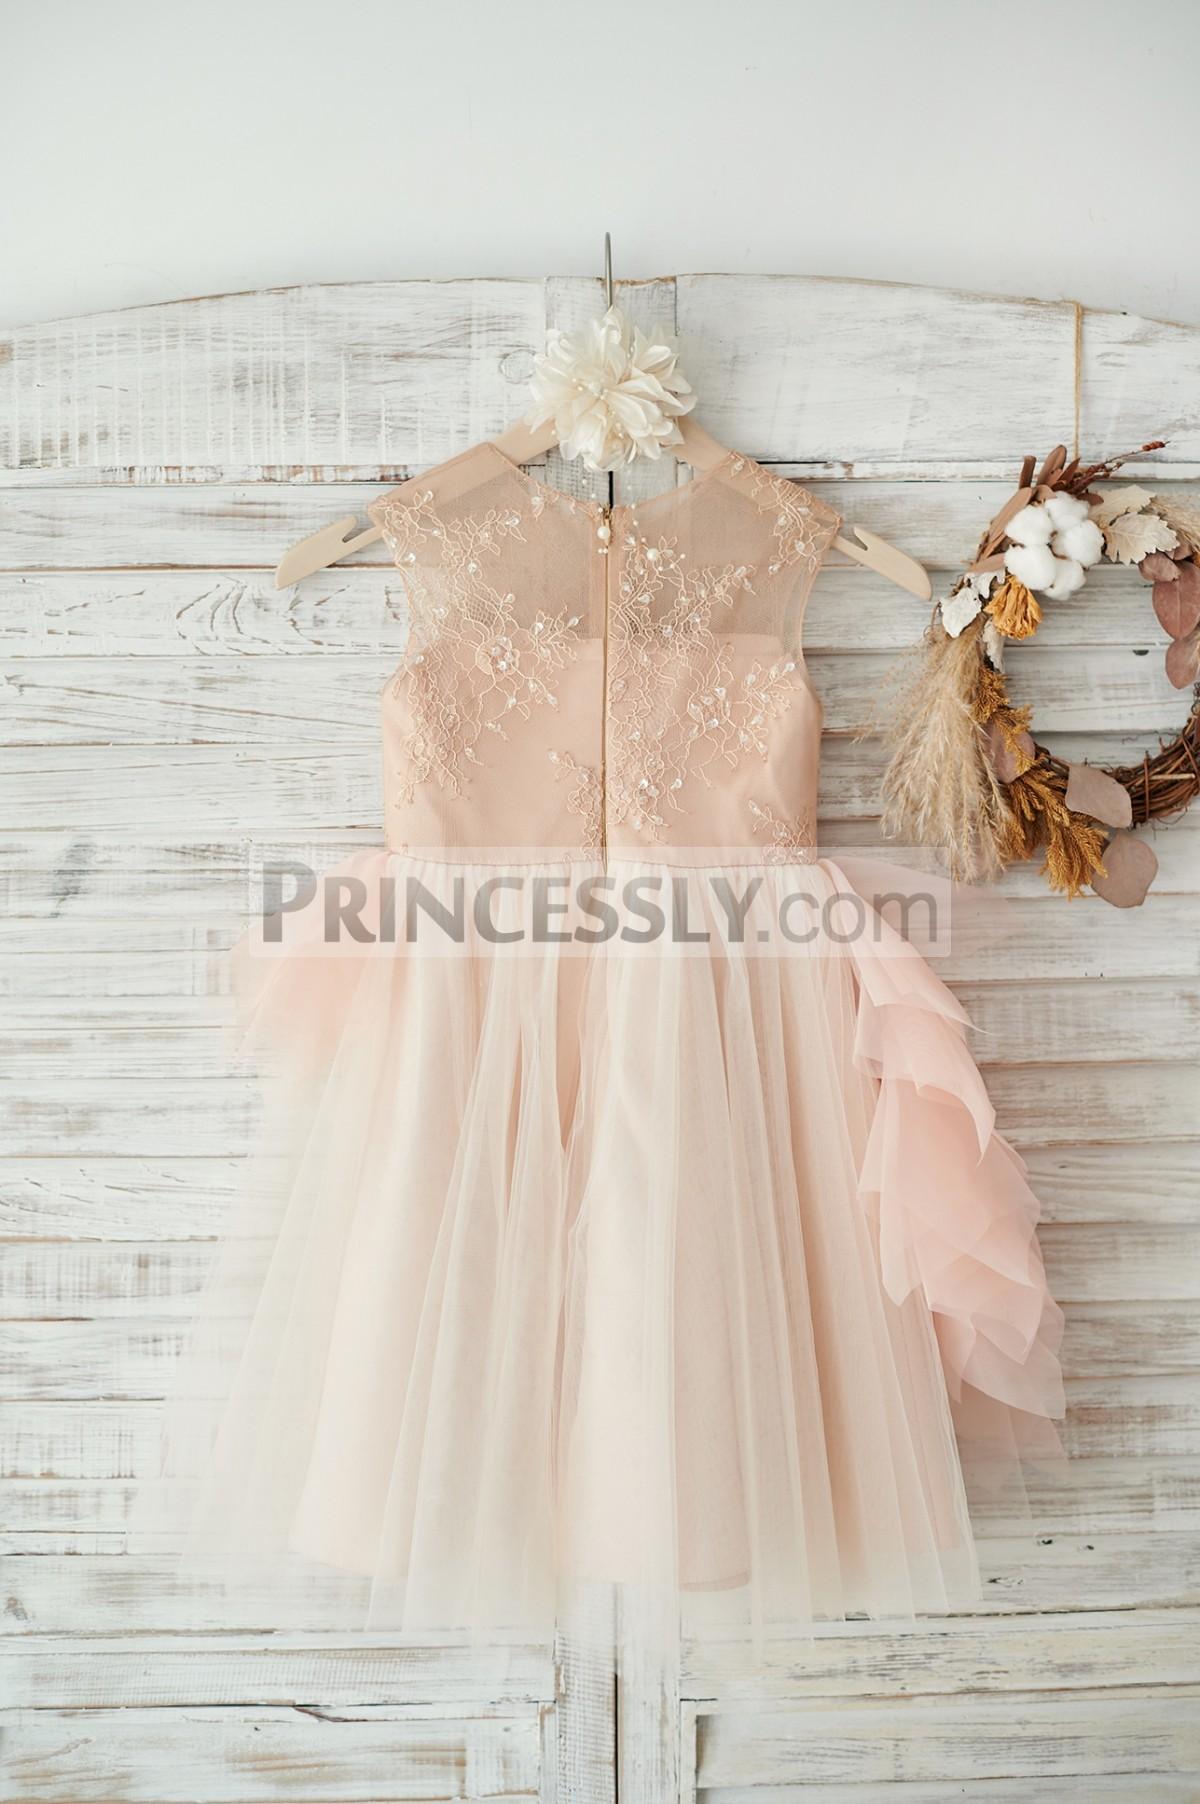 Sheer lace back tulle wedding baby girl dress